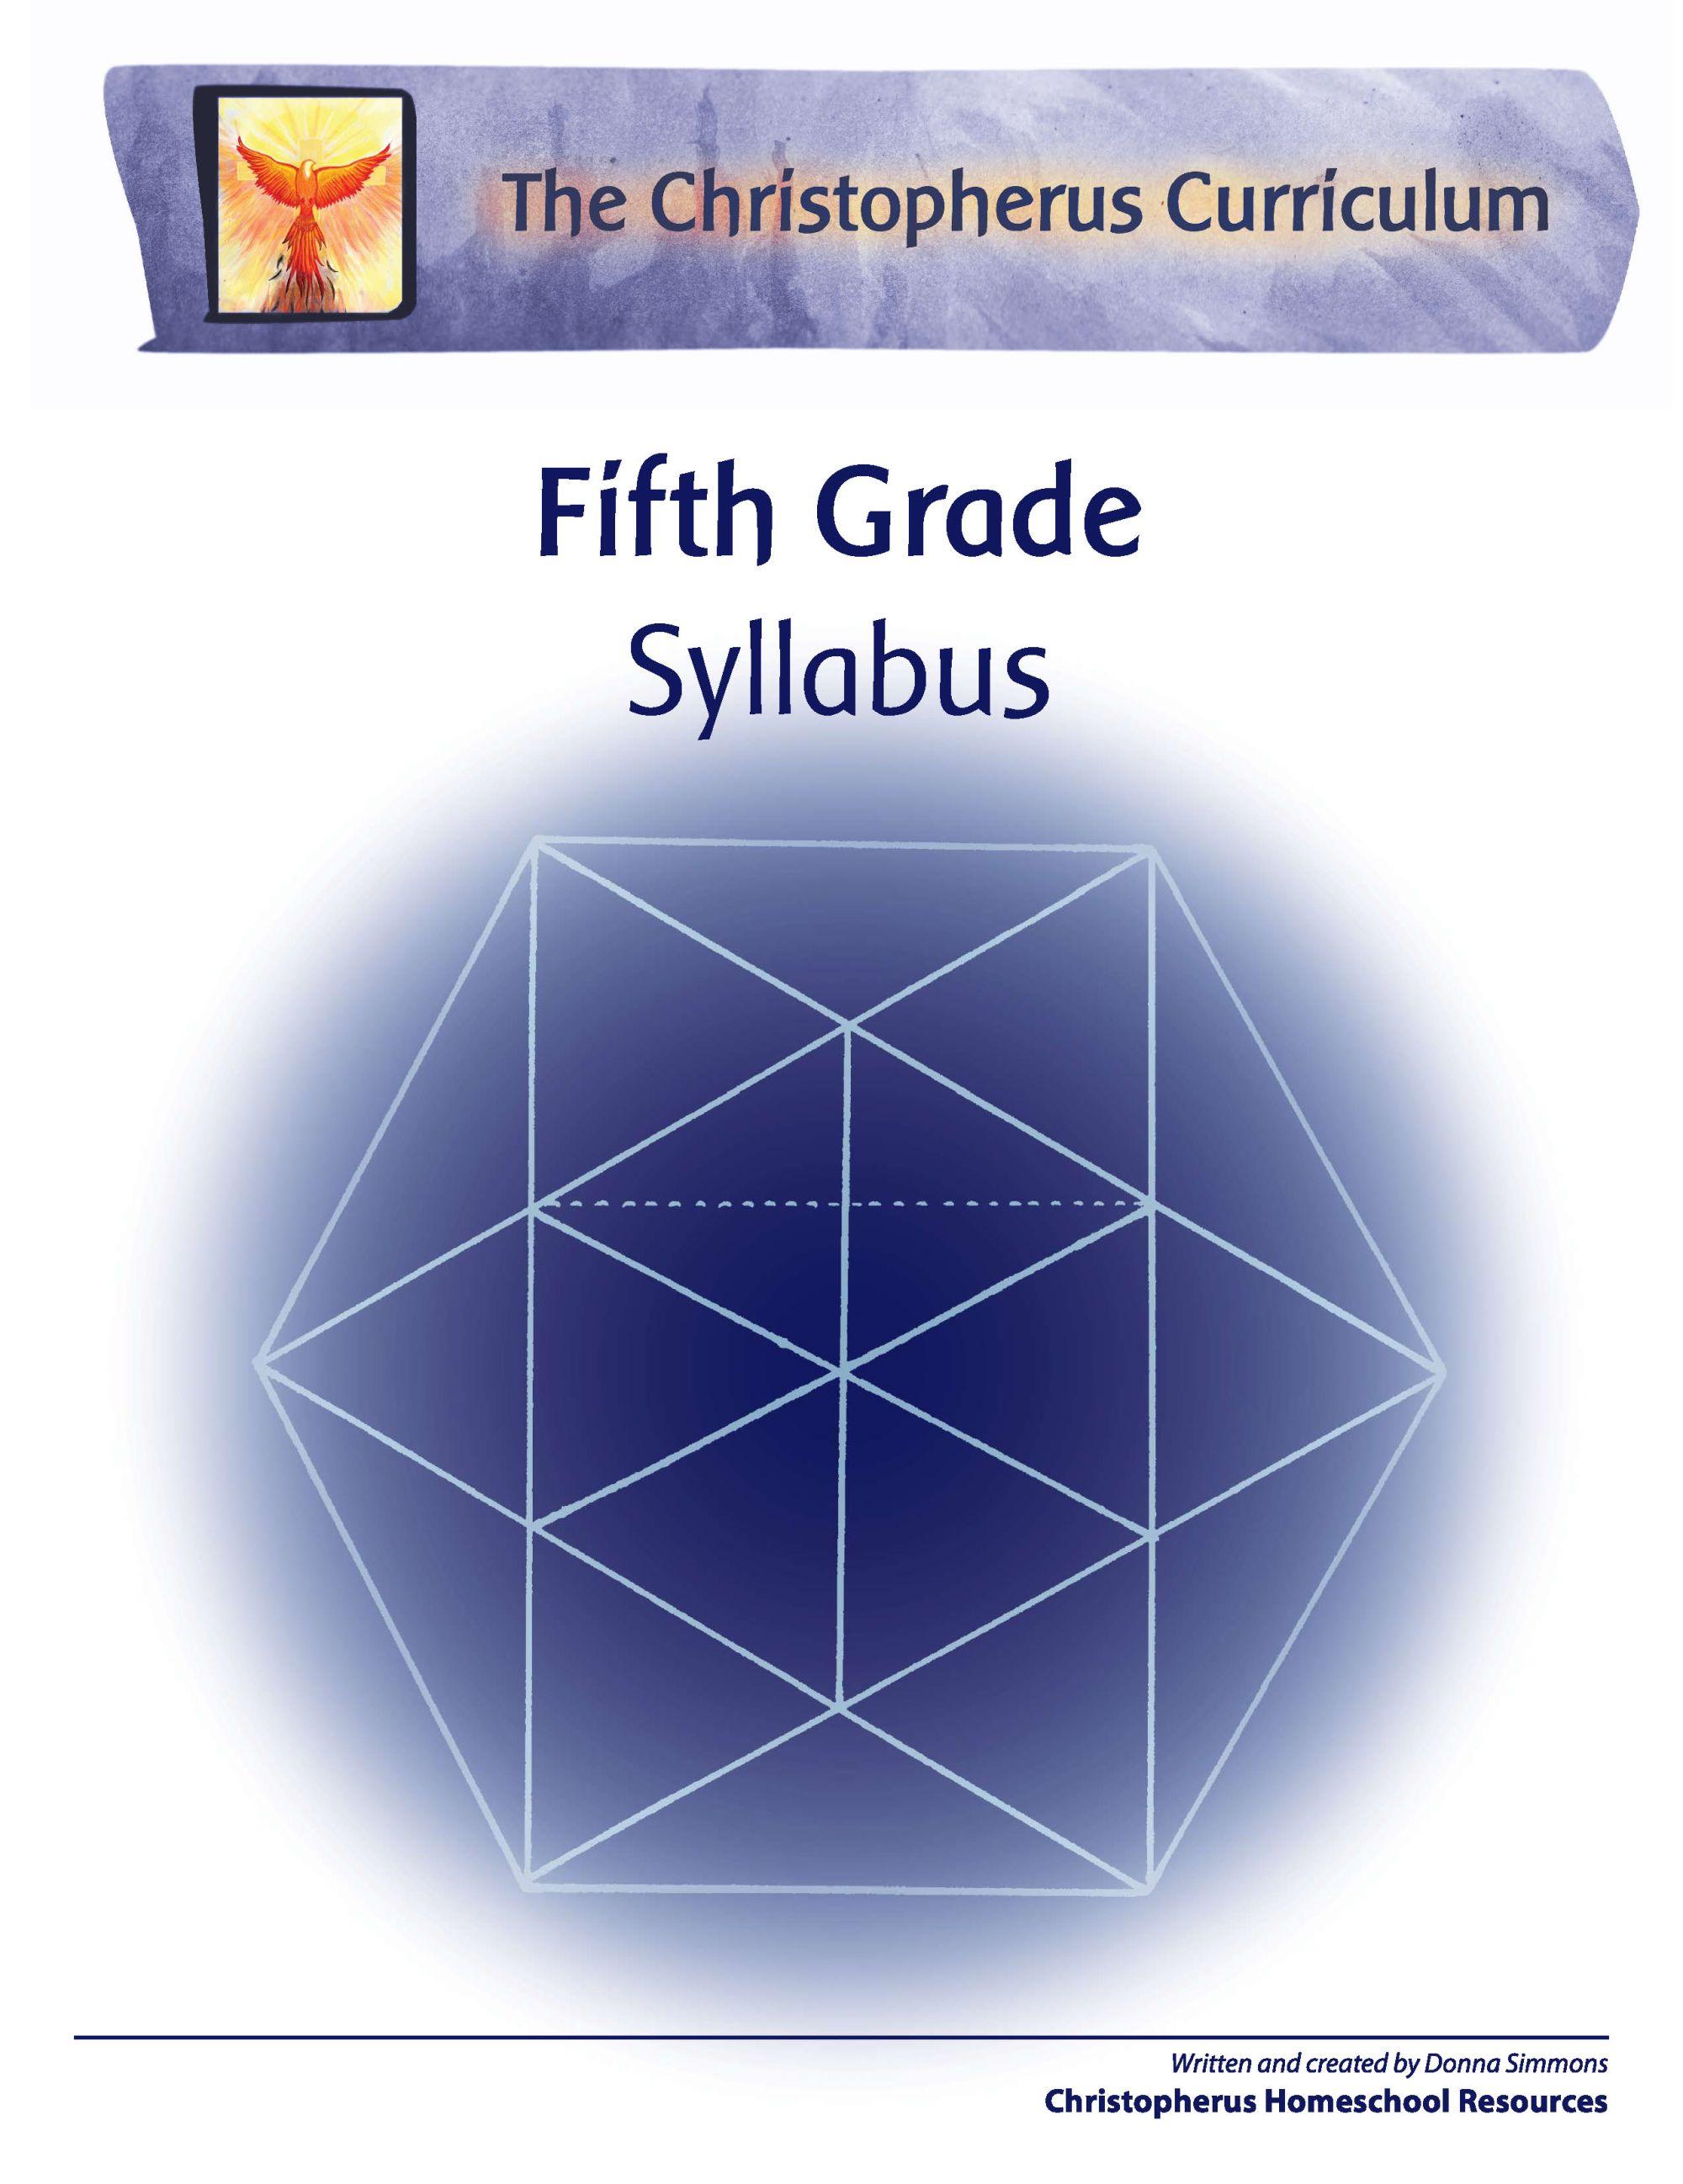 hight resolution of Christopherus Homeschool Resources » Fifth Grade Curriculum